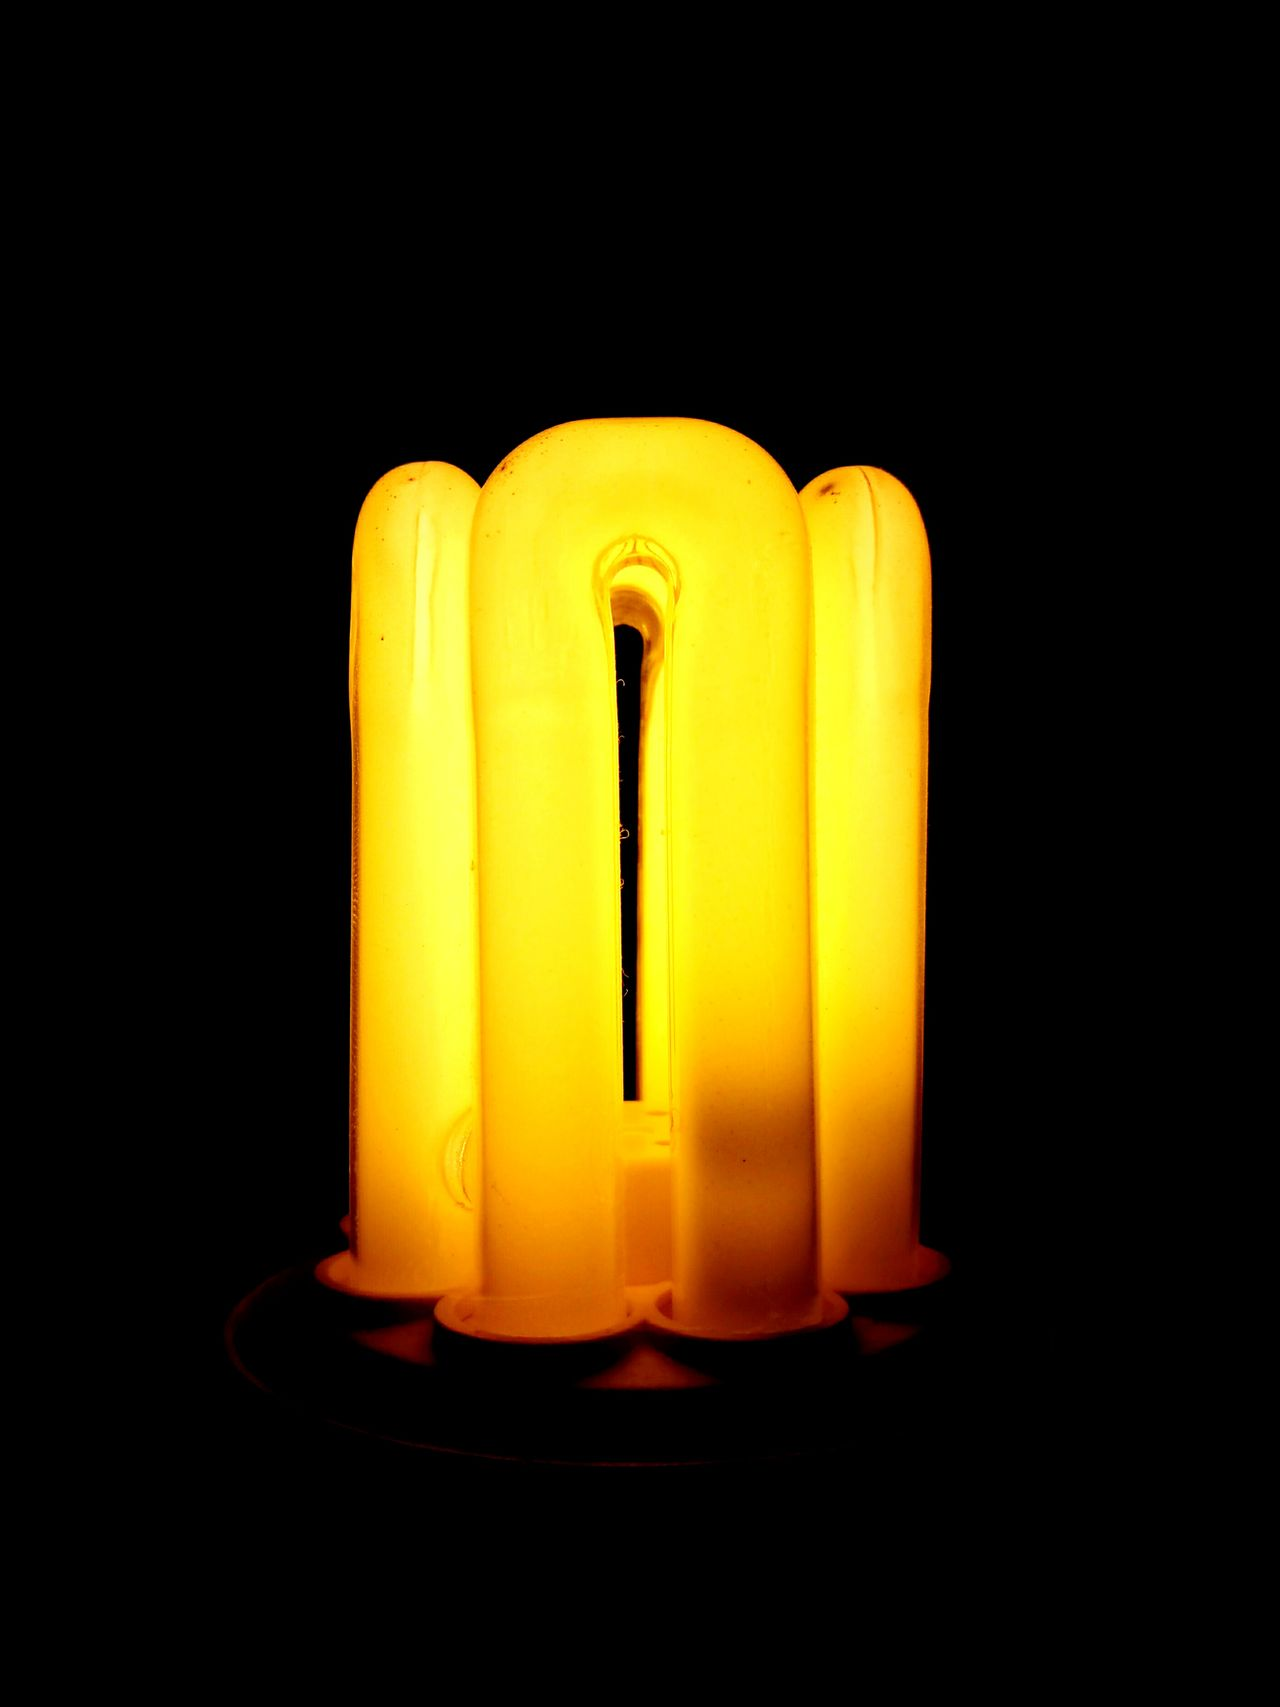 Illuminated Electricity  Single Object Lighting Equipment Black Background Studio Shot No People Close-up Detail Light Dark Darkness And Light Shutter Speed Bulb Light Bulb Shot Backgroud Backgrounds